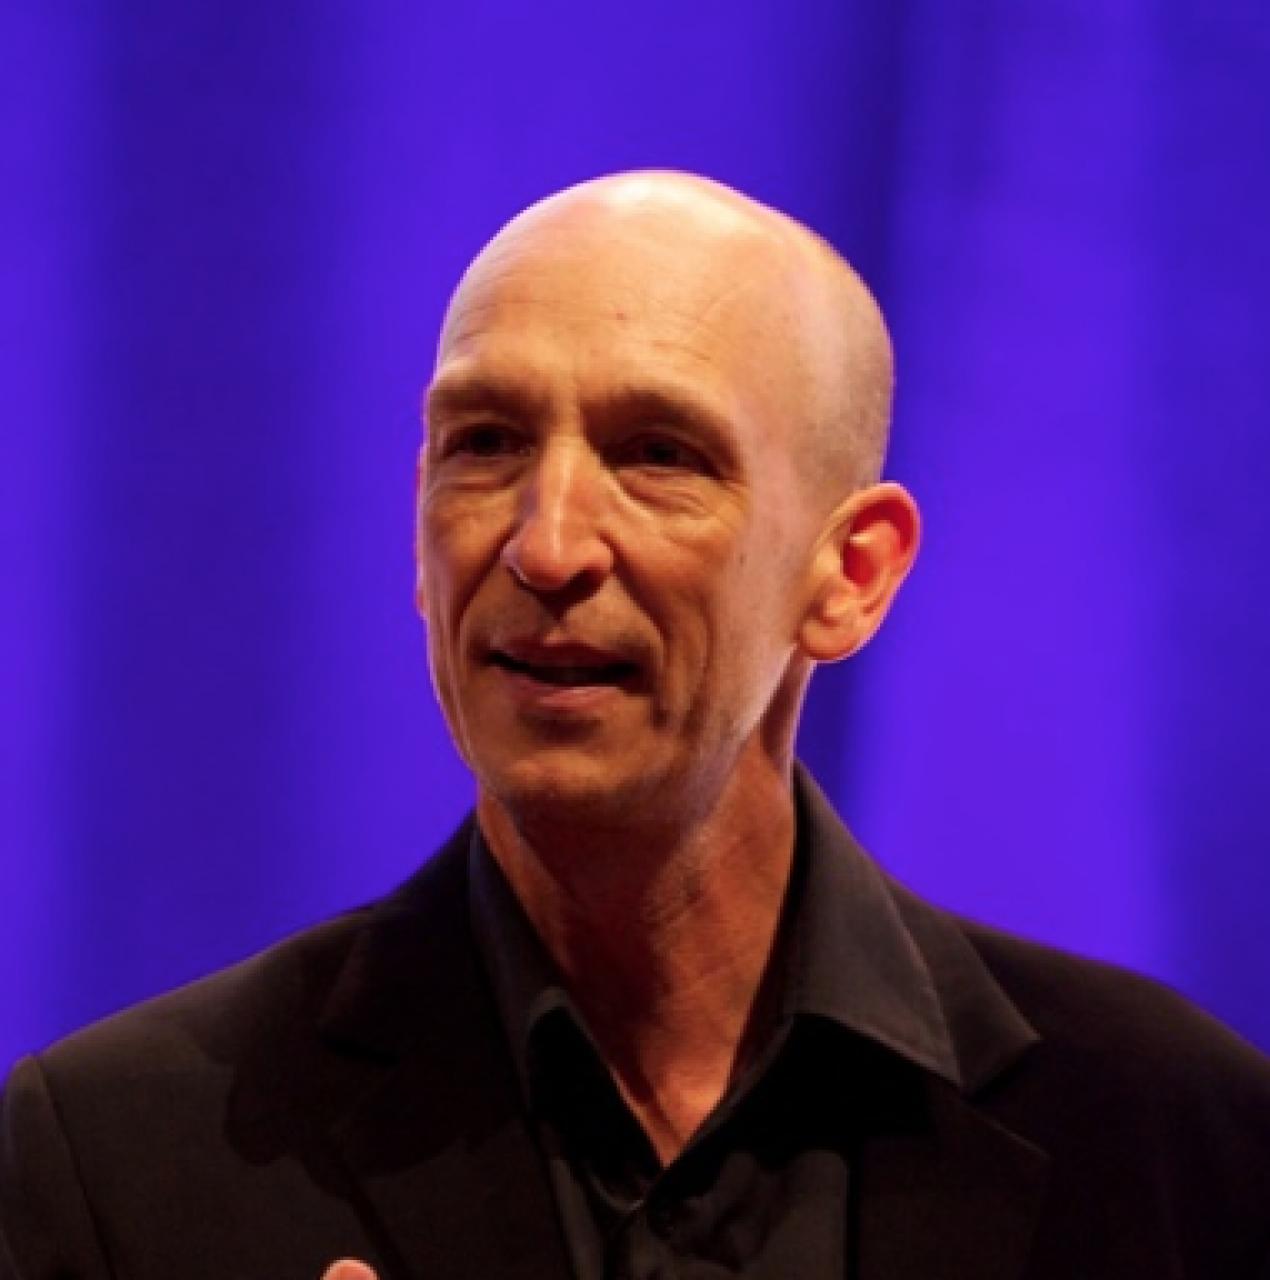 Gary Bertwistle